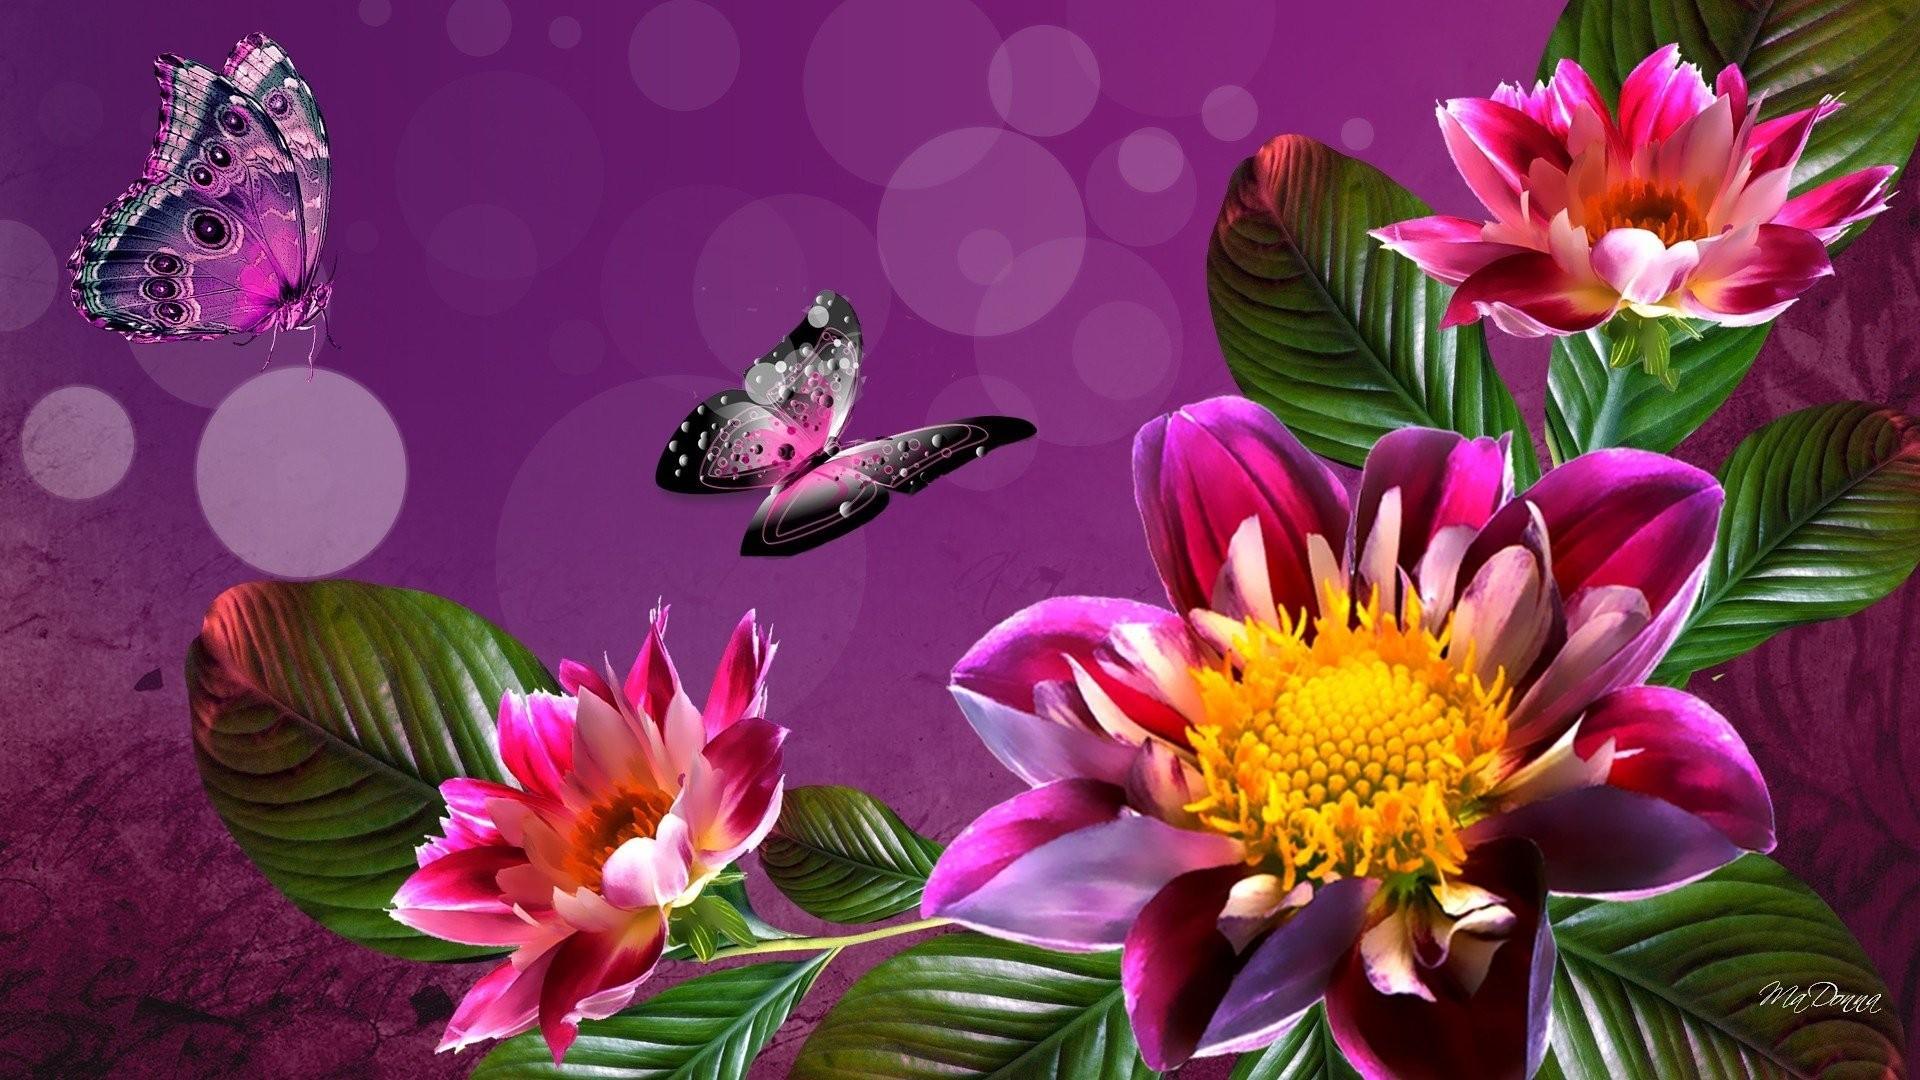 Flowers Hd Wallpapers Full Screen Flowers Healthy